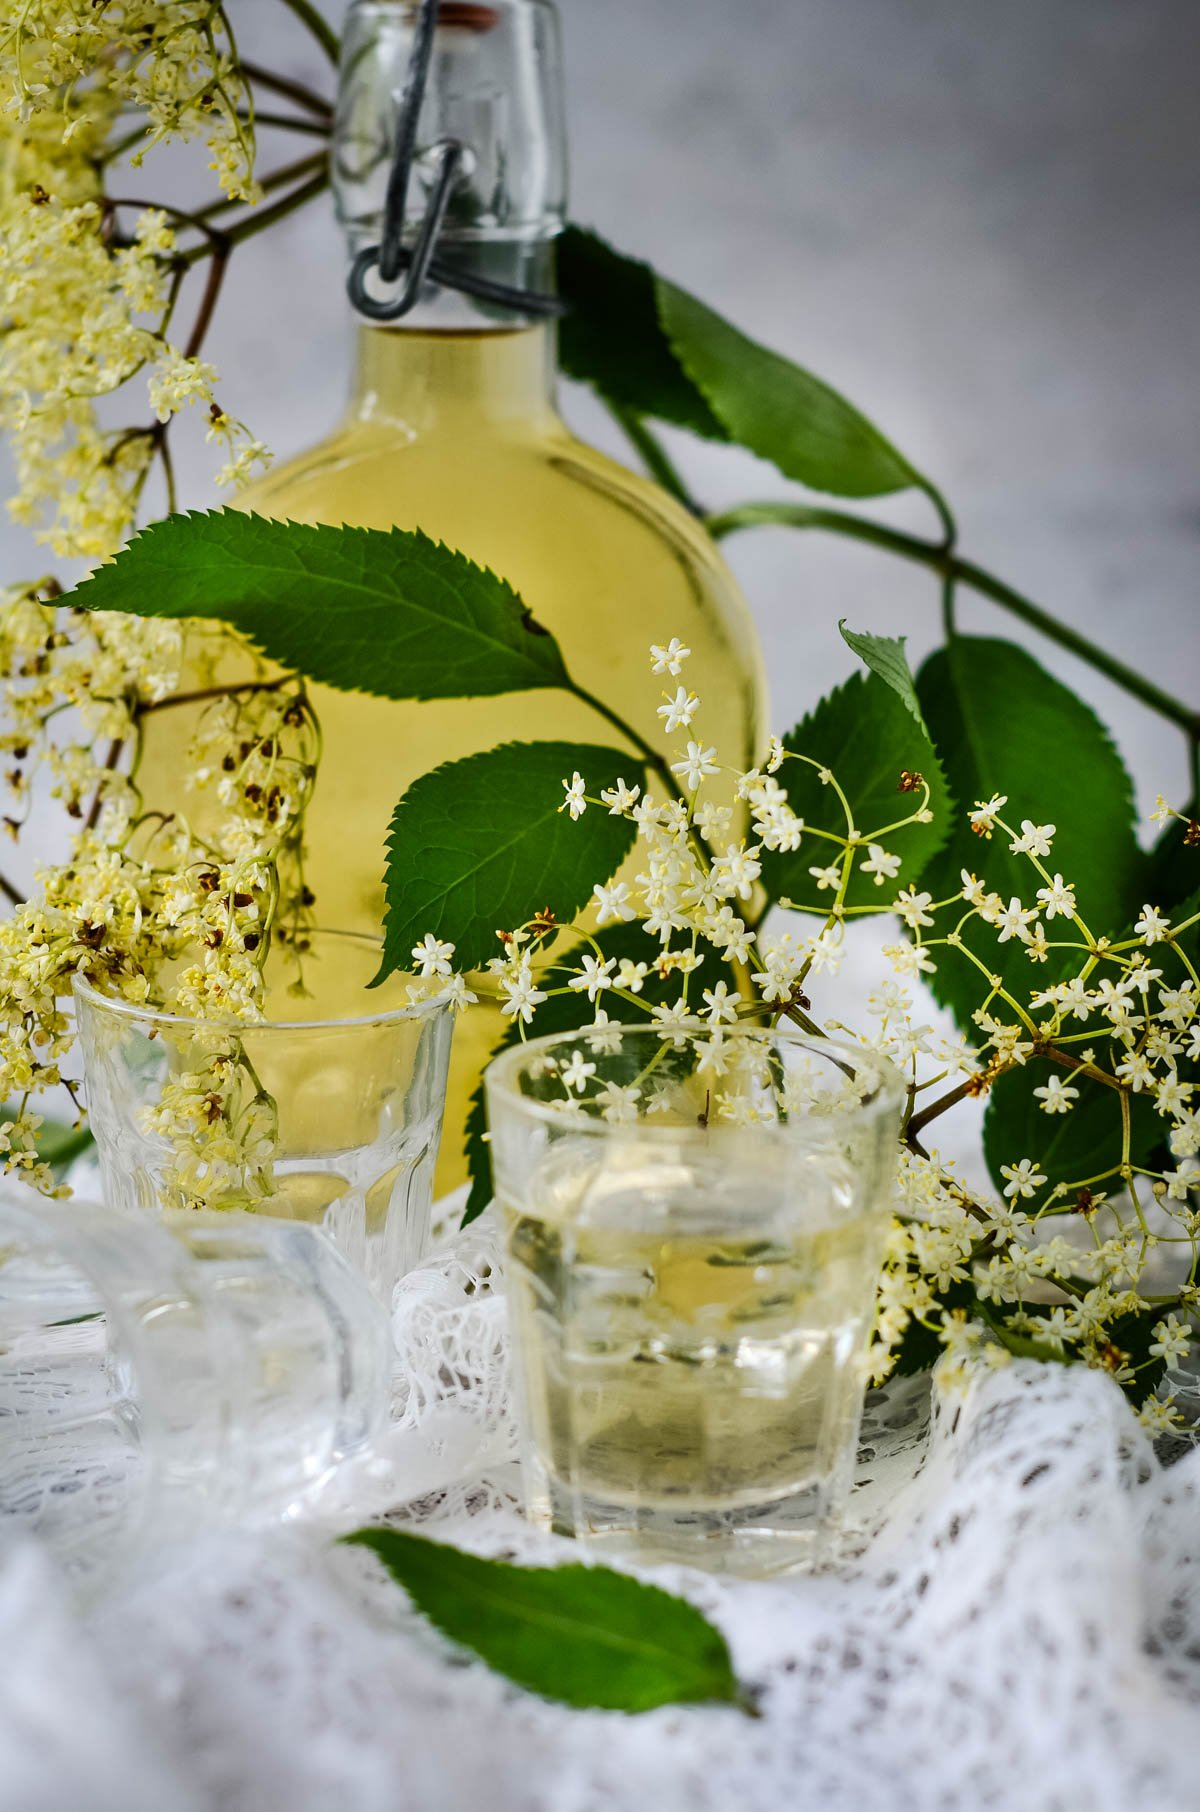 elderflower liqueur with bottle in background